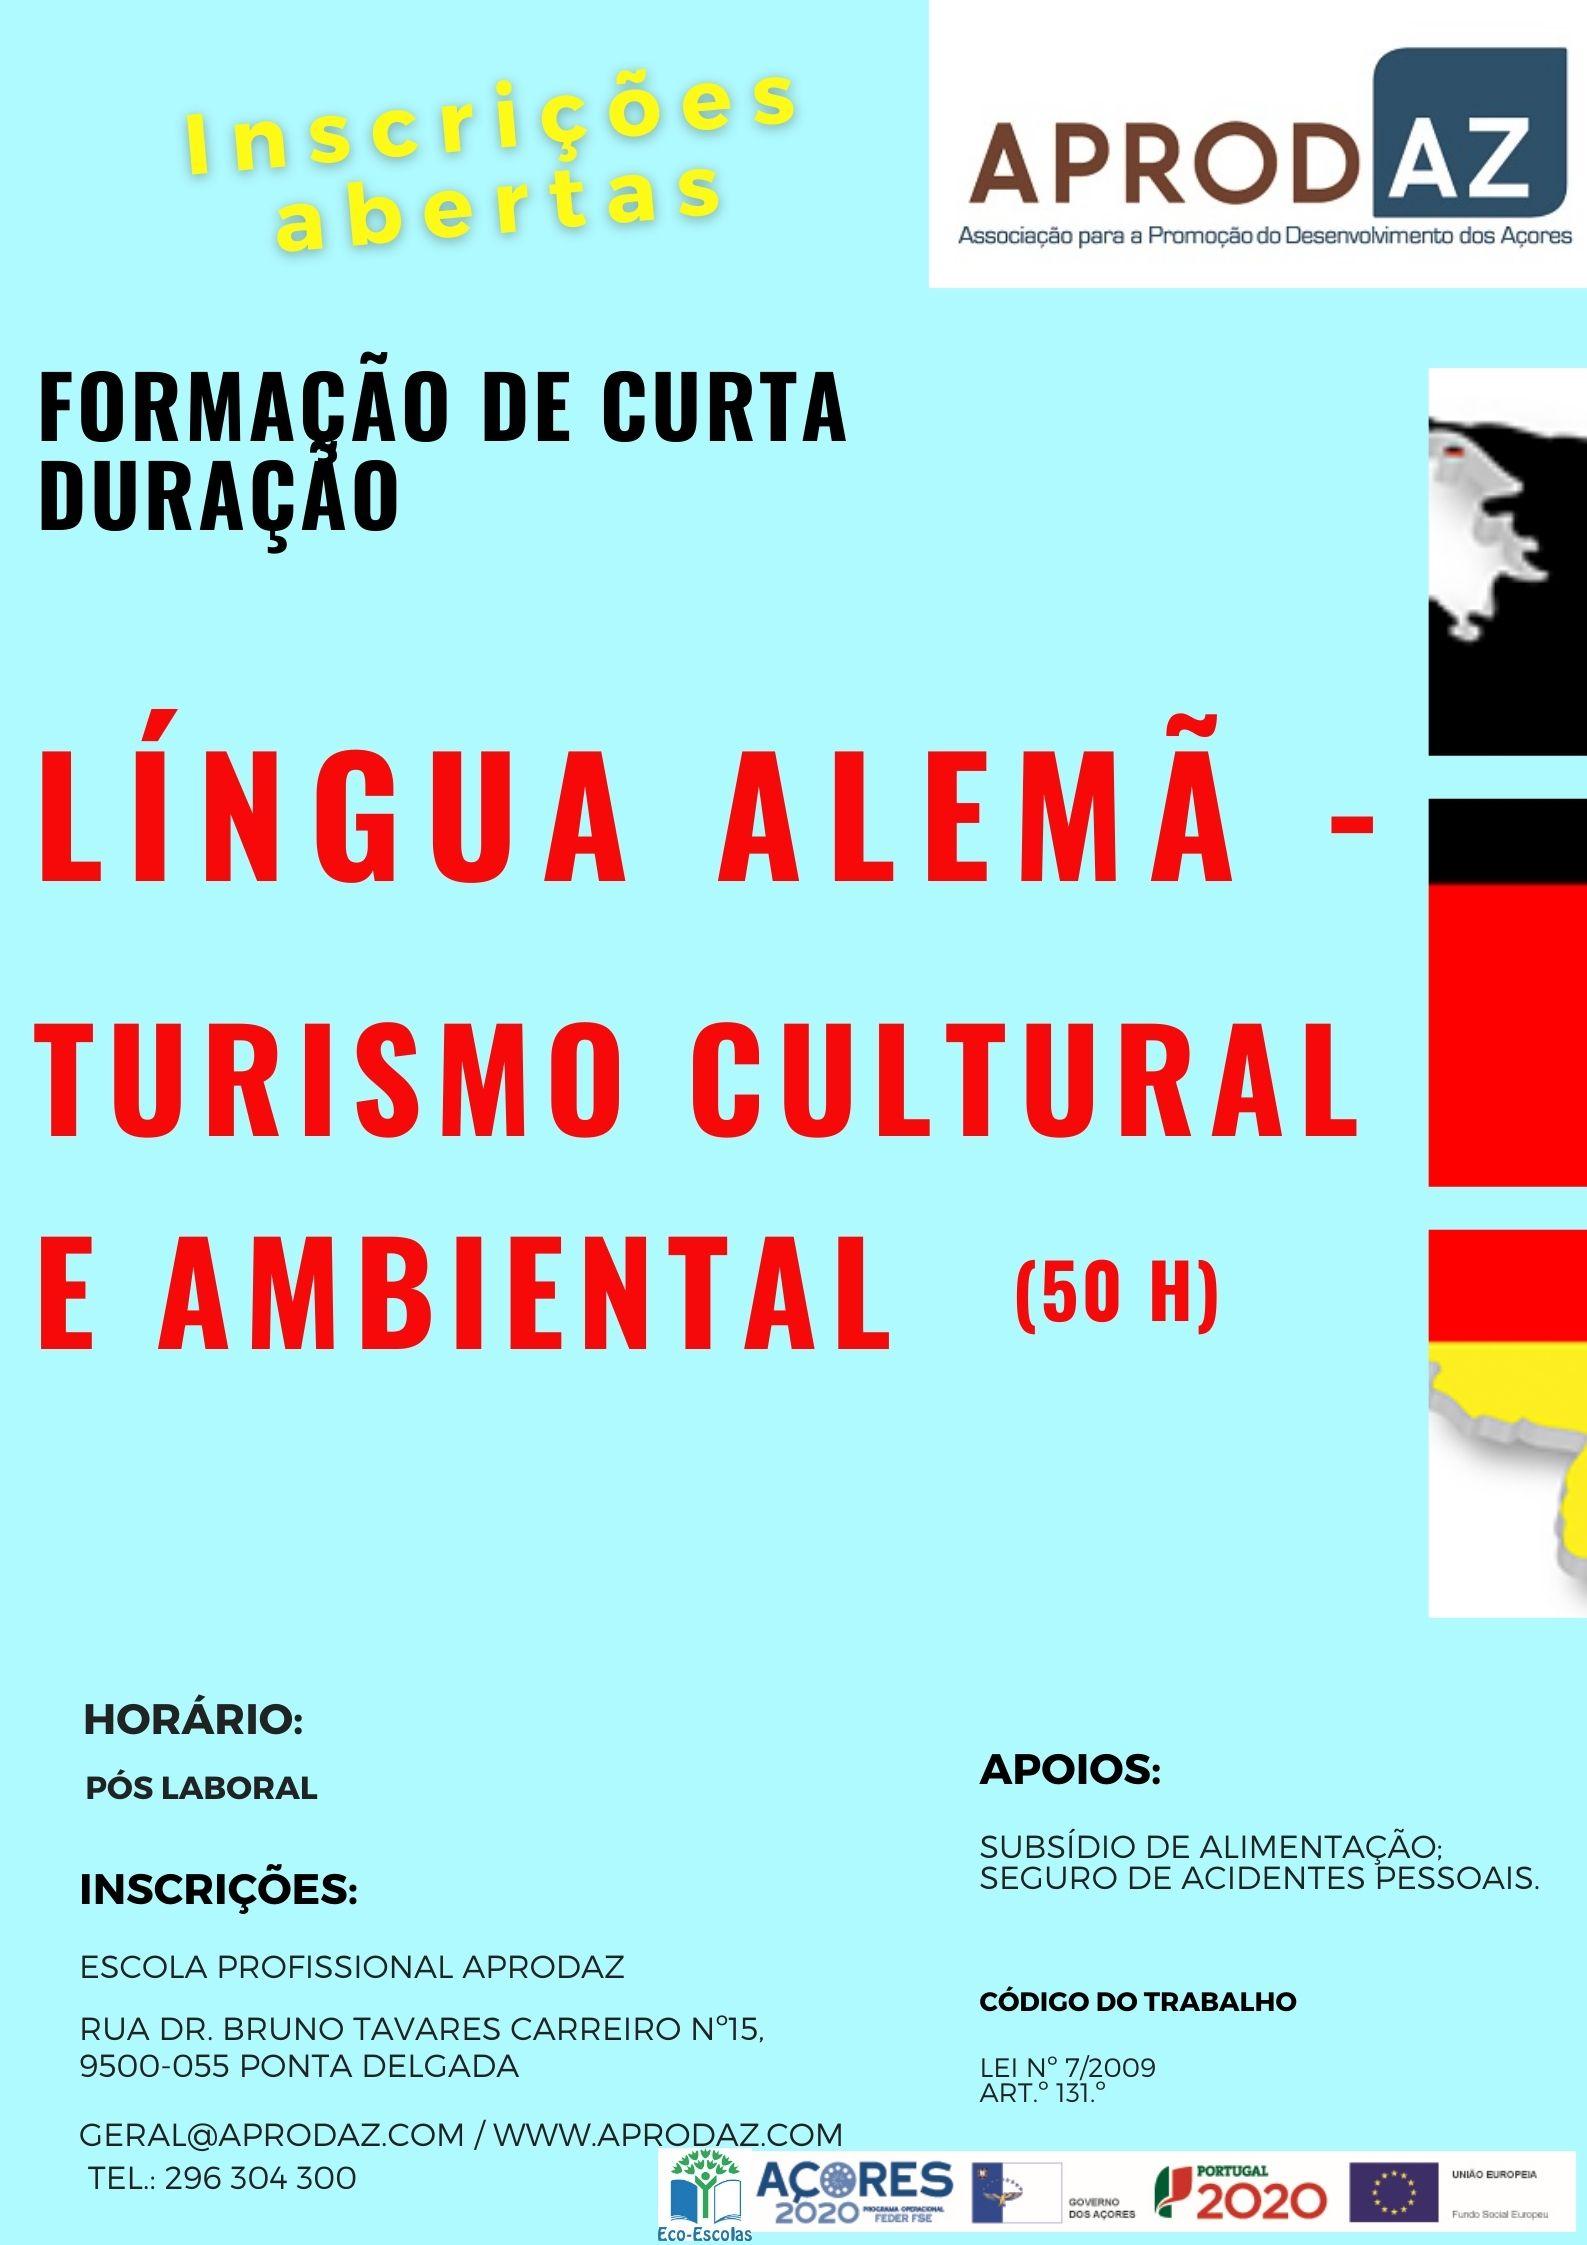 lngua-alem---turismo.jpg